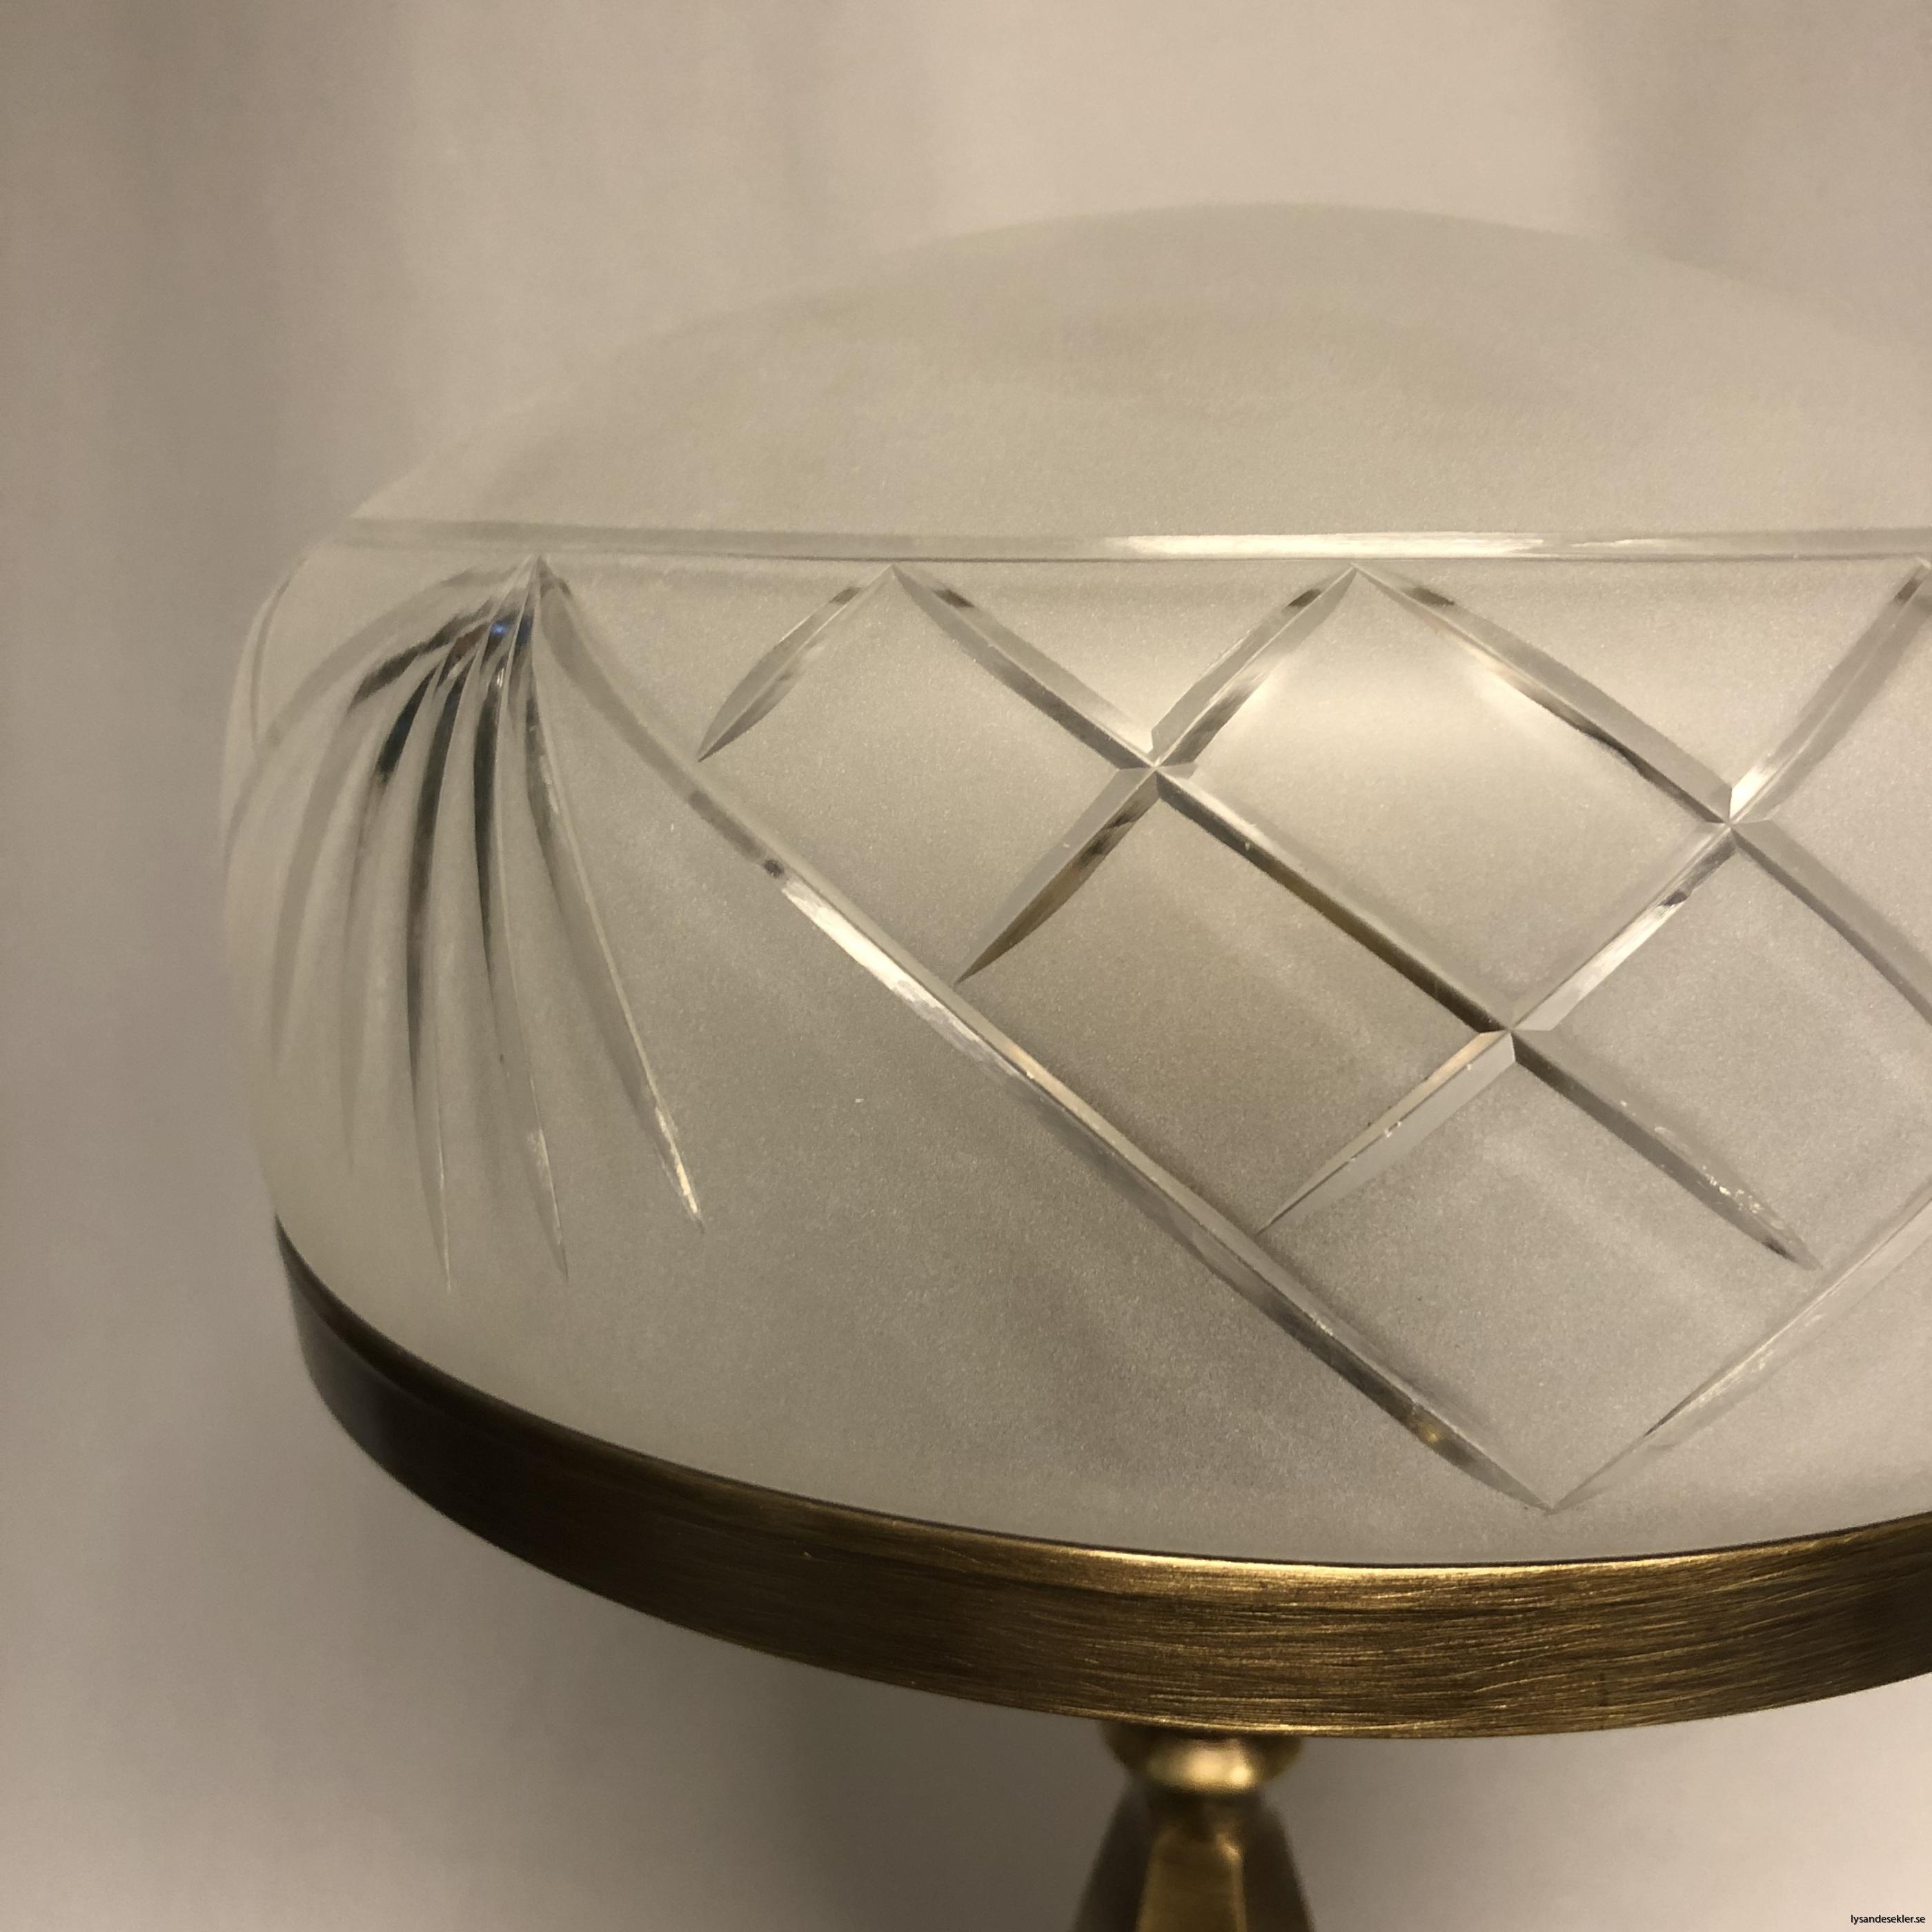 strindbergslampa strindbergslampor strindberg lampa skärm kupa strindbergsskärm strindbergskupa23